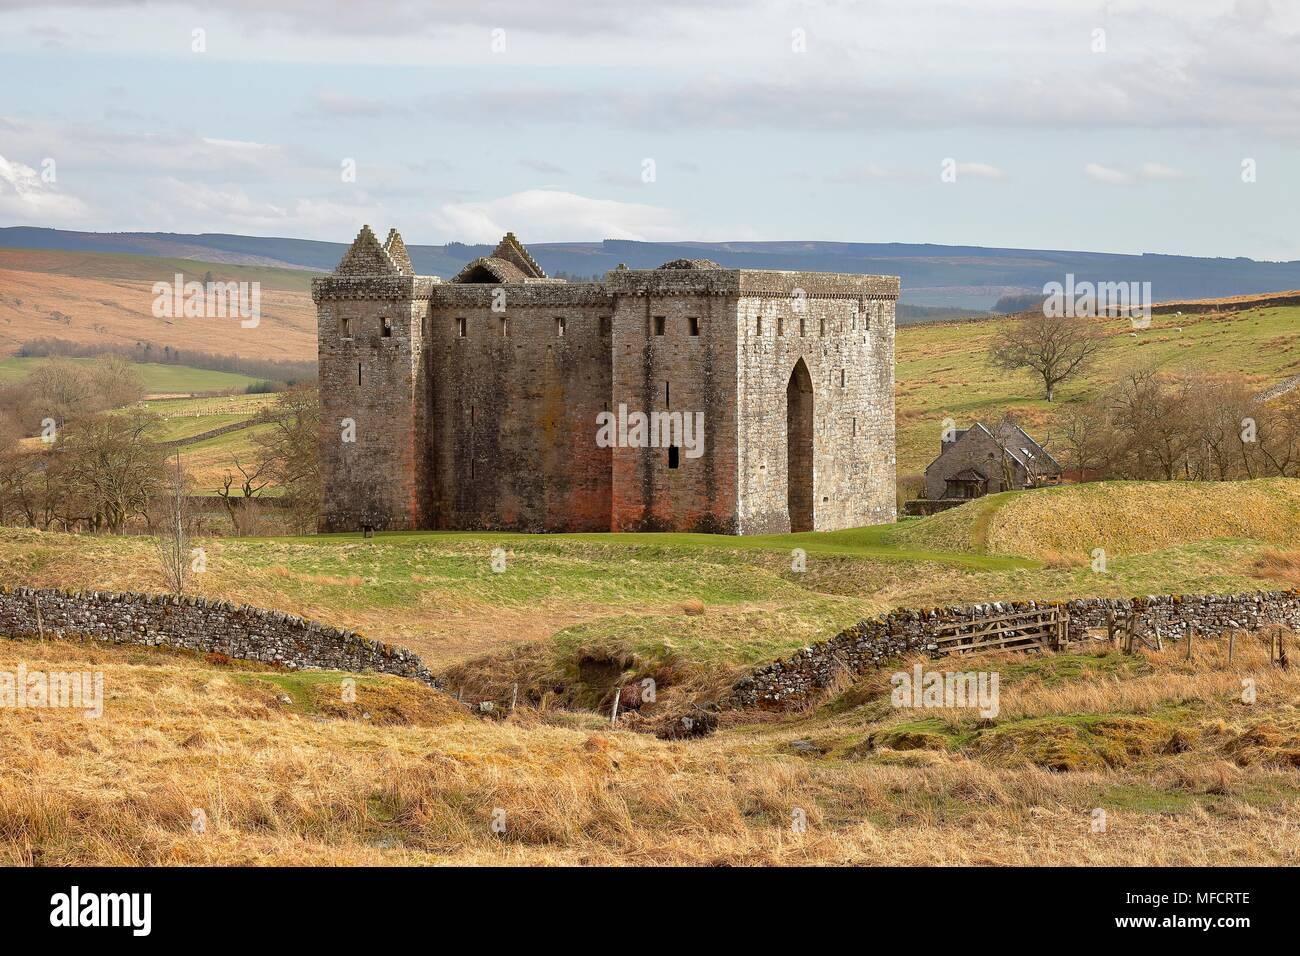 Hermitage Castle, Newcastleton, Roxburghshire, Scottish Borders, Scotland, located in the debatable lands between England and Scotland. Stock Photo